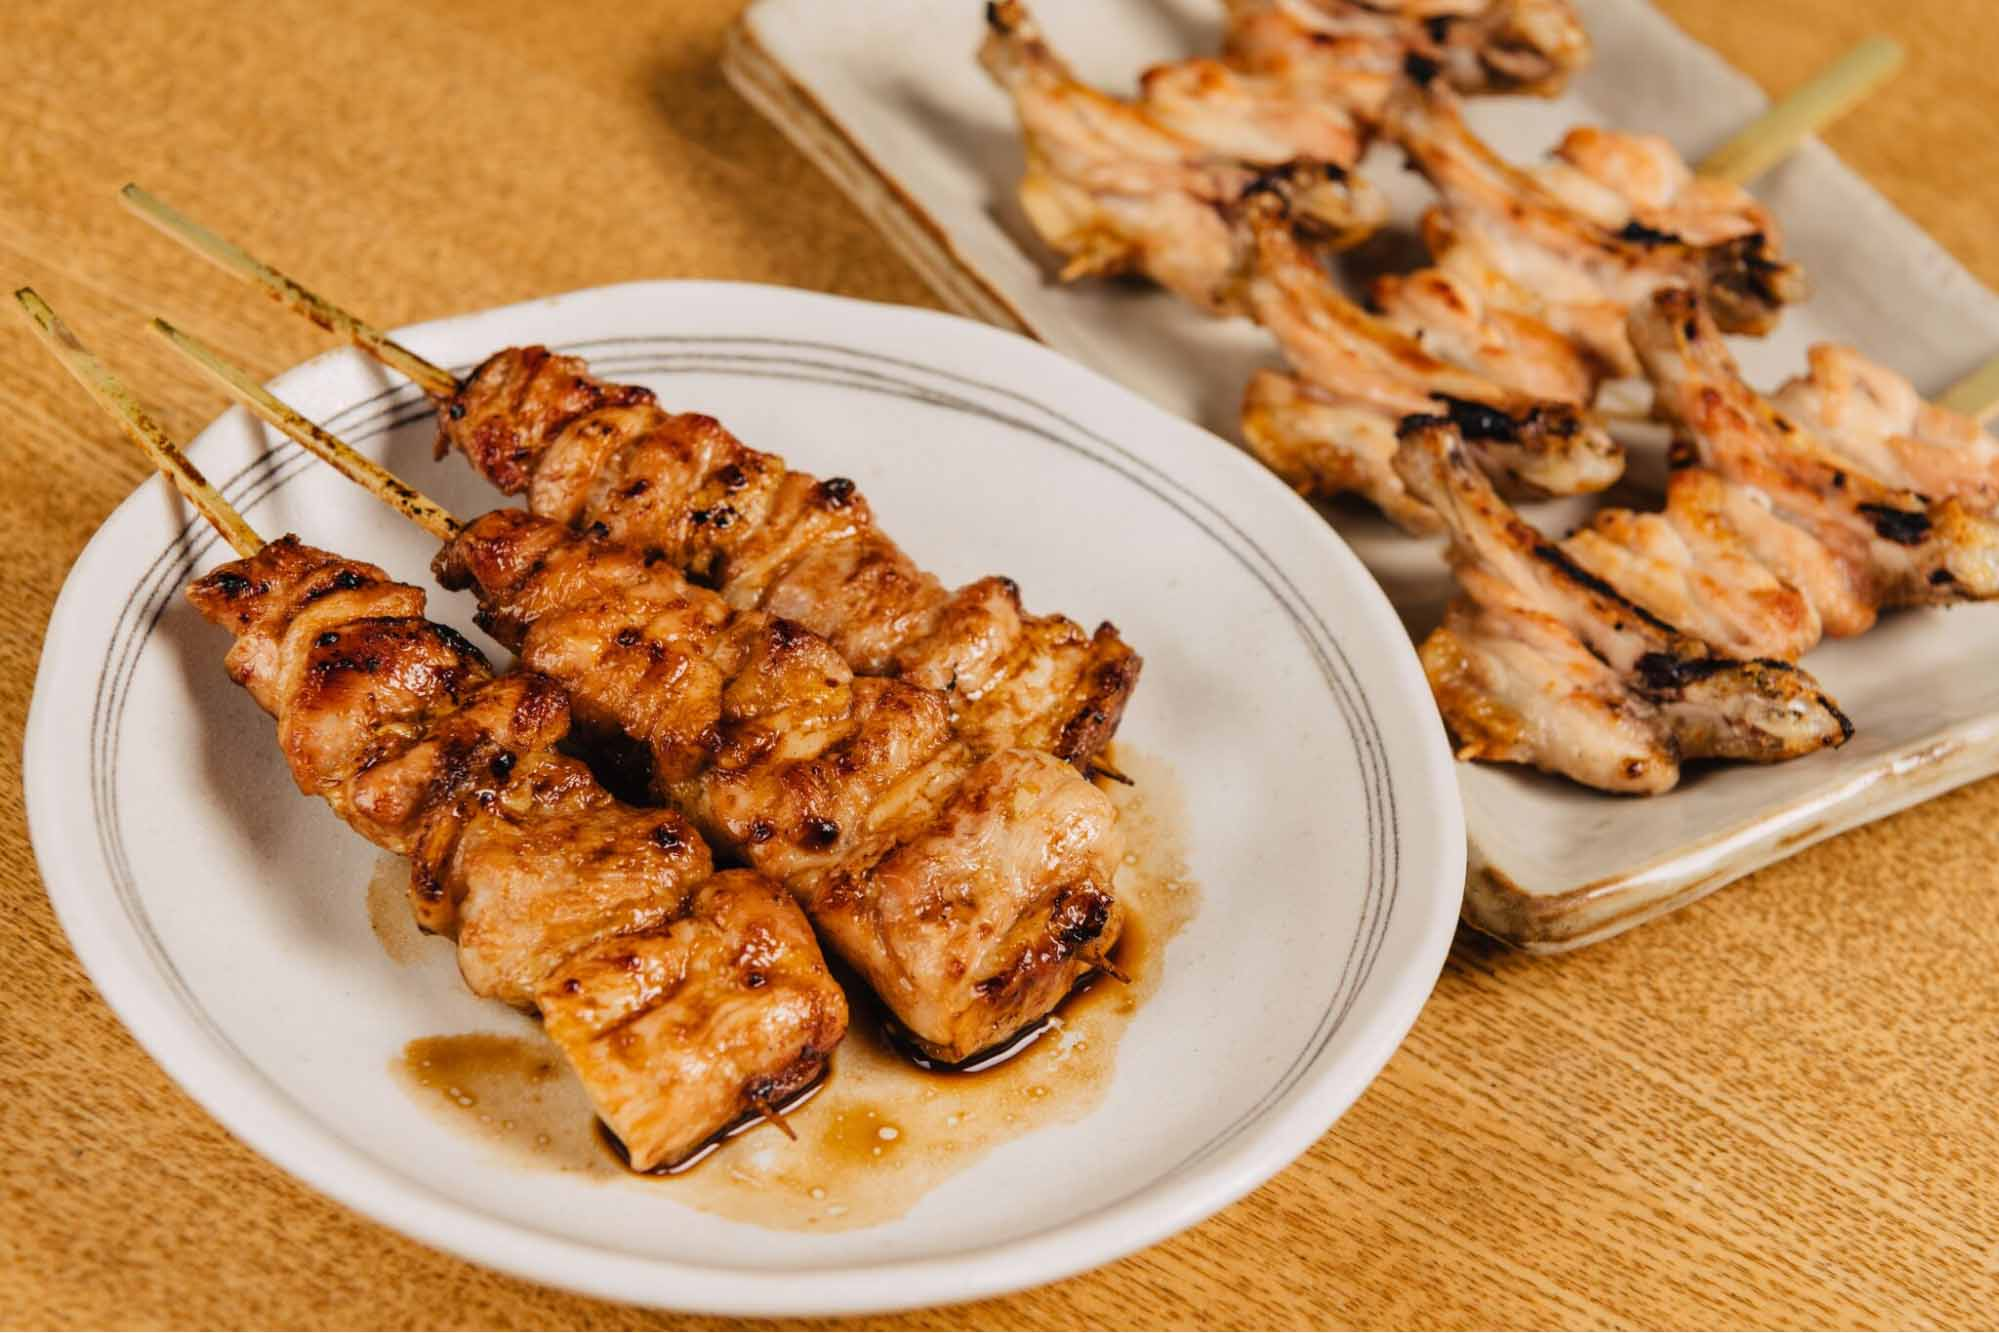 Michelin guide street food festival toritama shirokane